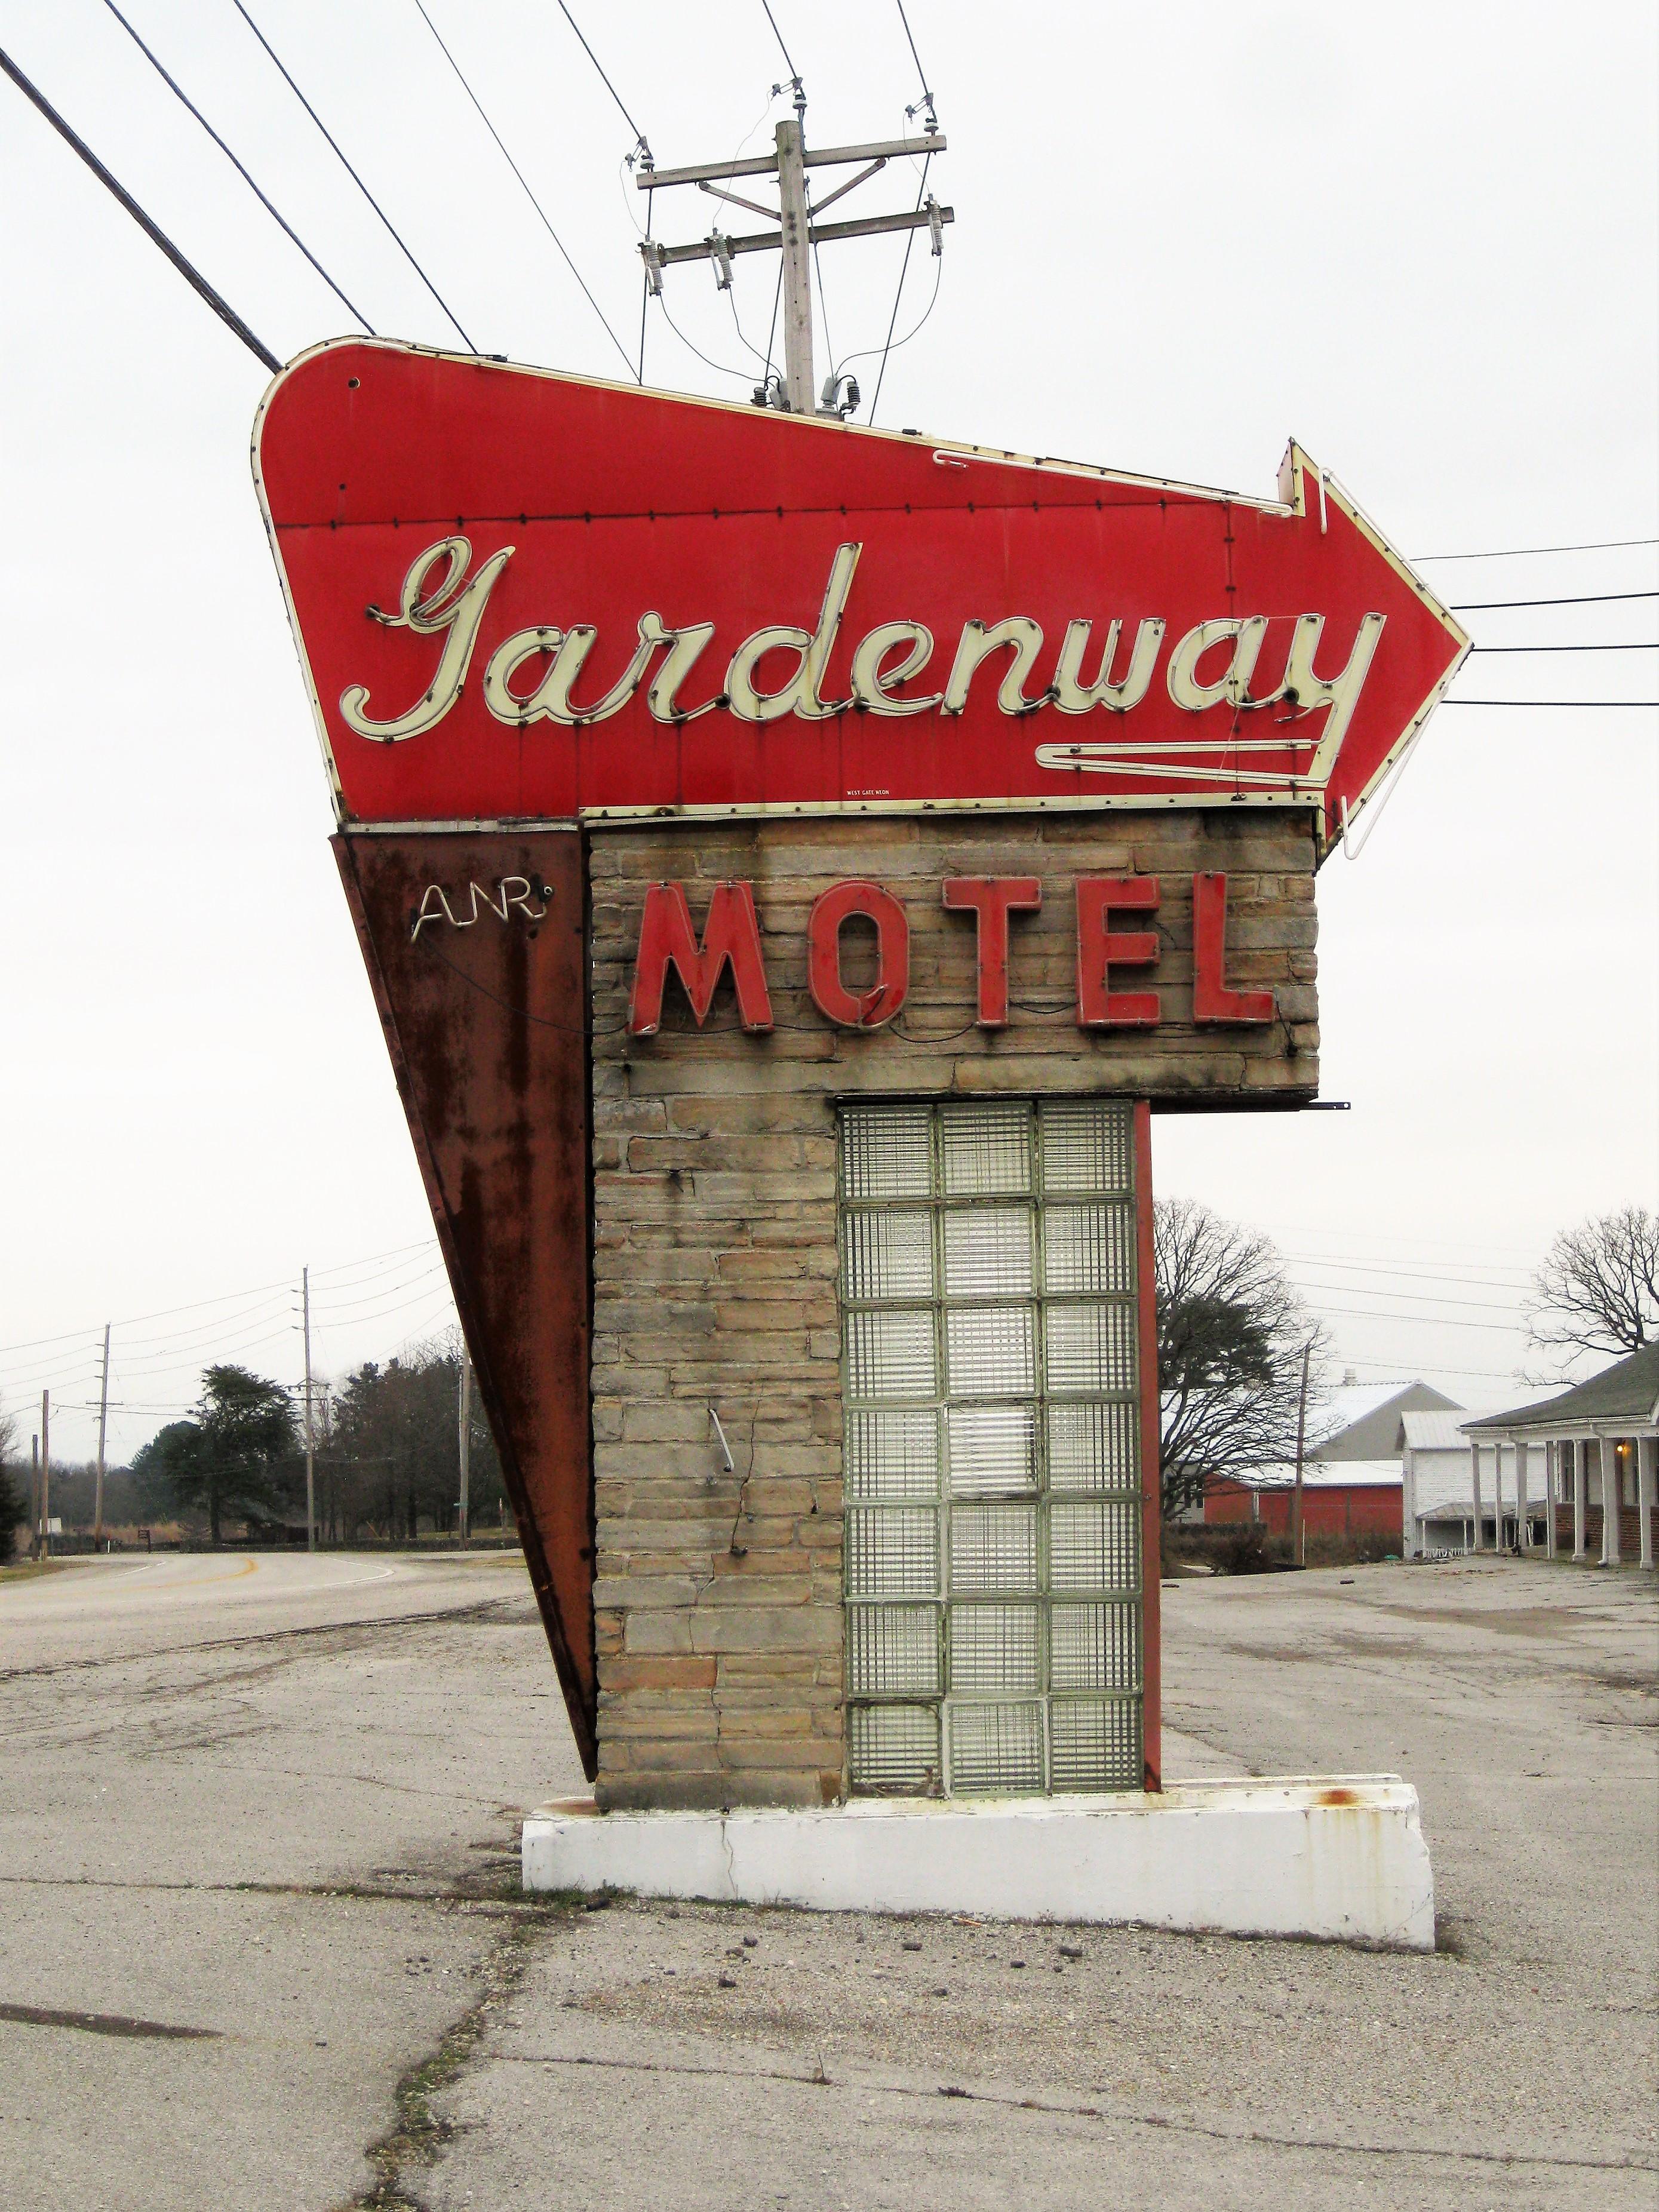 Gardenway Motel - 2958 Missouri Route 100, Villa Ridge, Missouri U.S.A. - January 22, 2017